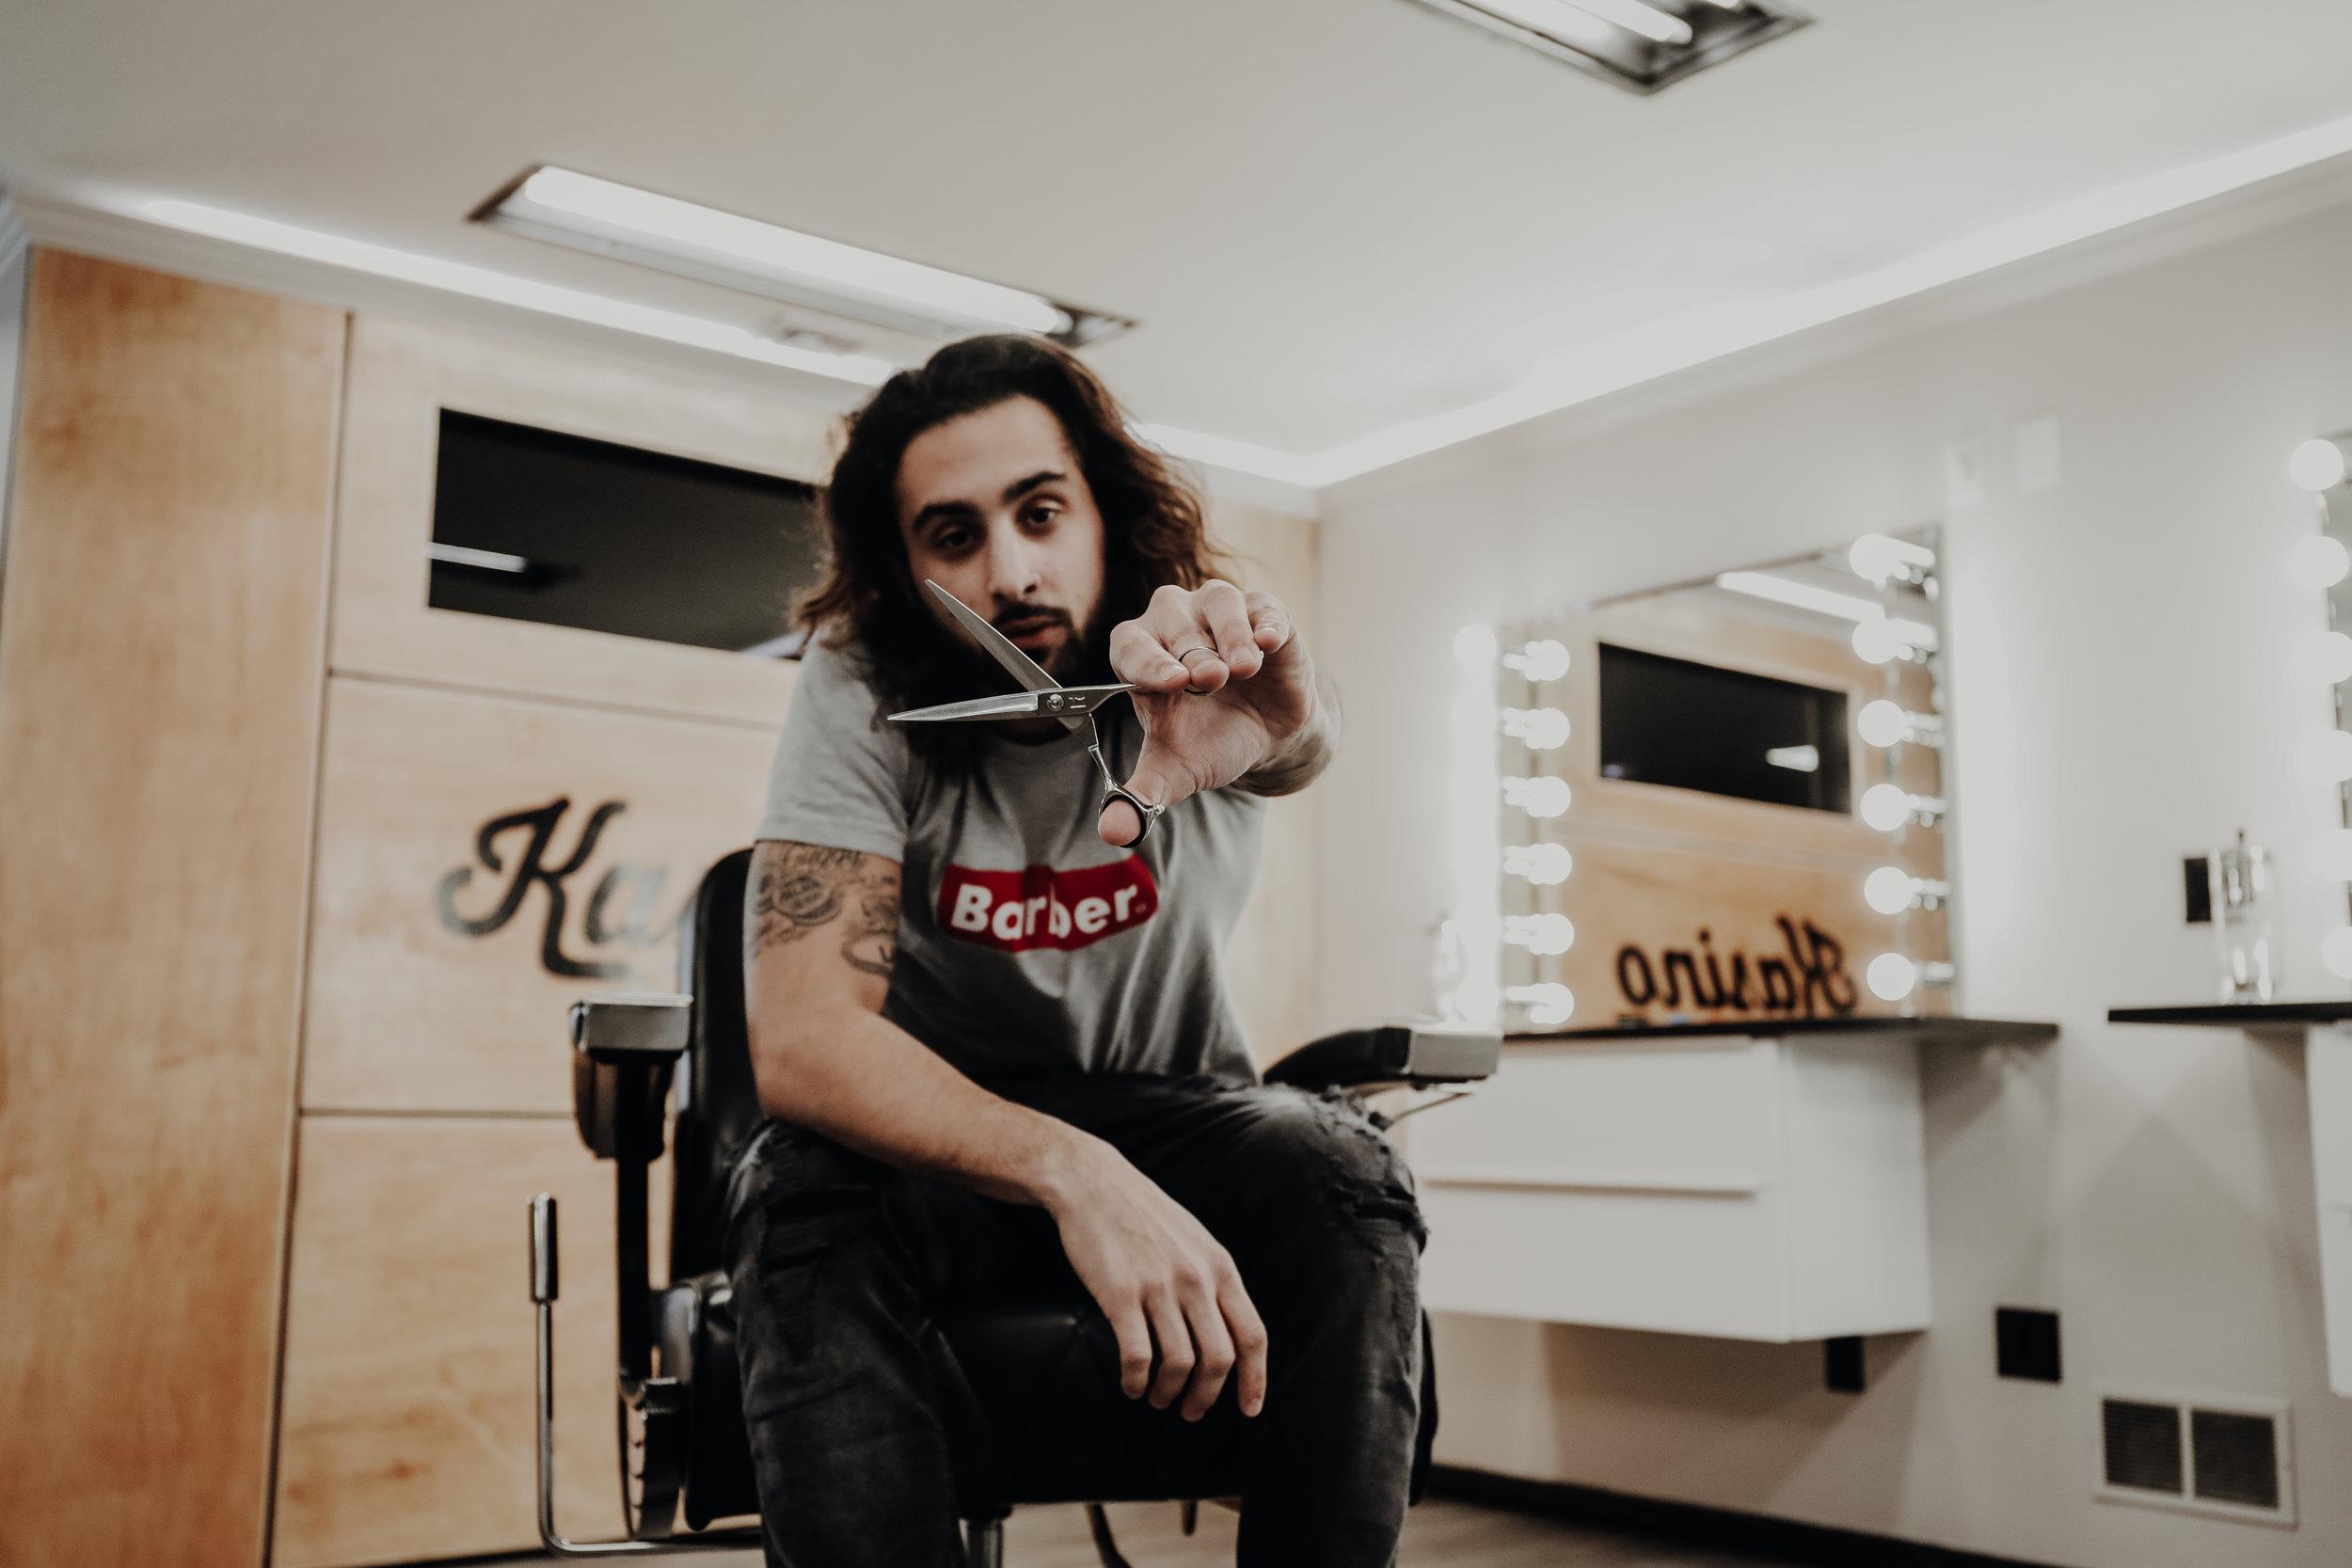 niko the barber gucci gang (14 of 1).jpg